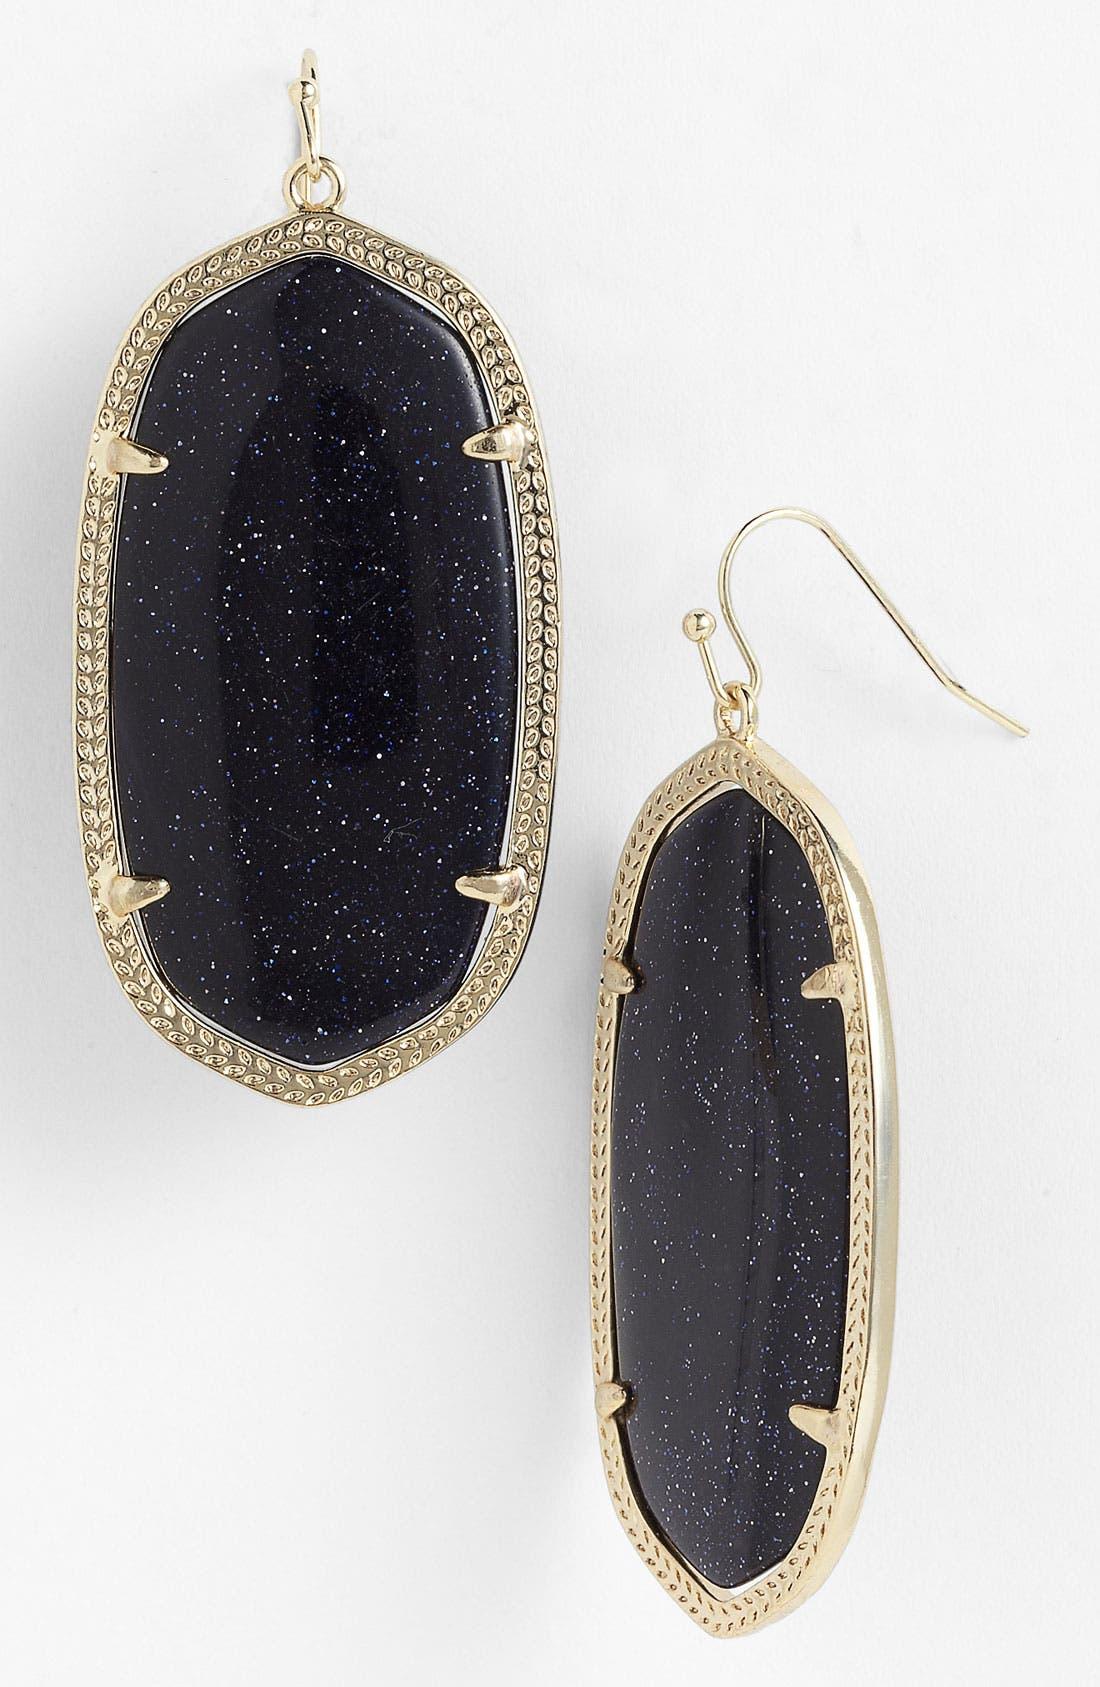 Alternate Image 1 Selected - Kendra Scott 'Danielle' Oval Statement Earrings